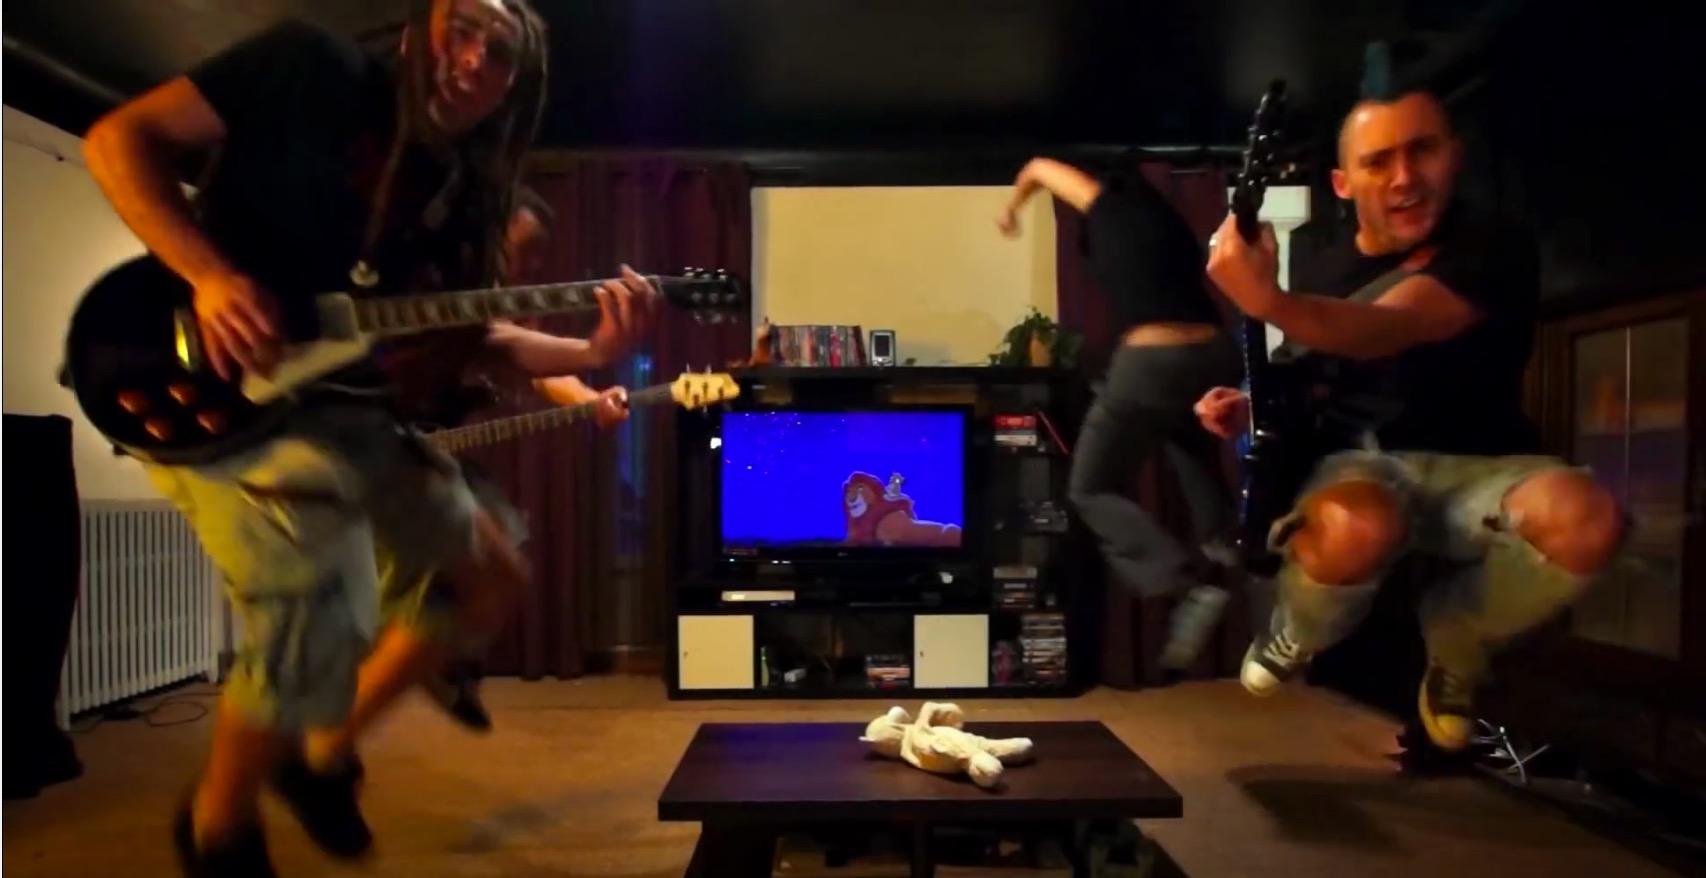 les chansons disney vf reprisent version rock f noweb. Black Bedroom Furniture Sets. Home Design Ideas